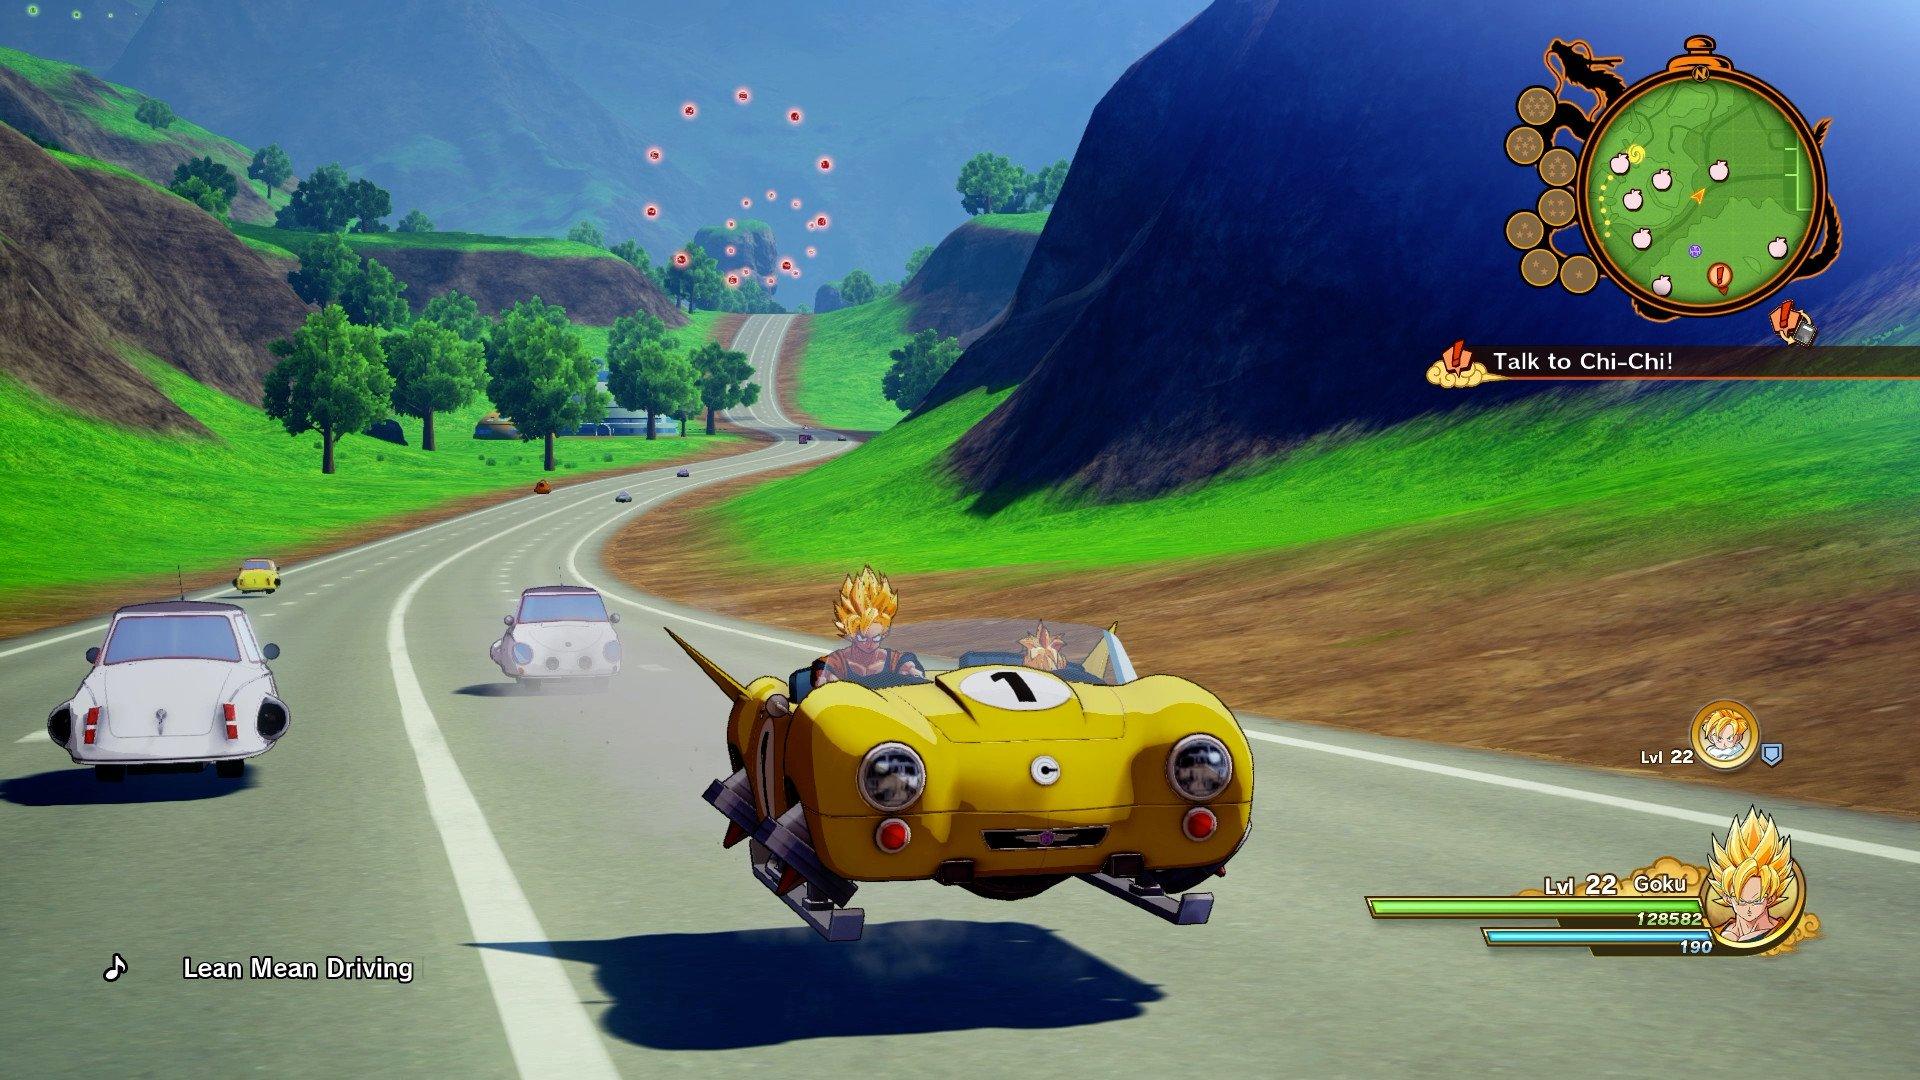 Скриншот к игре Dragon Ball Z: Kakarot [v 1.03 + DLCs] (2020) скачать торрент RePack от xatab